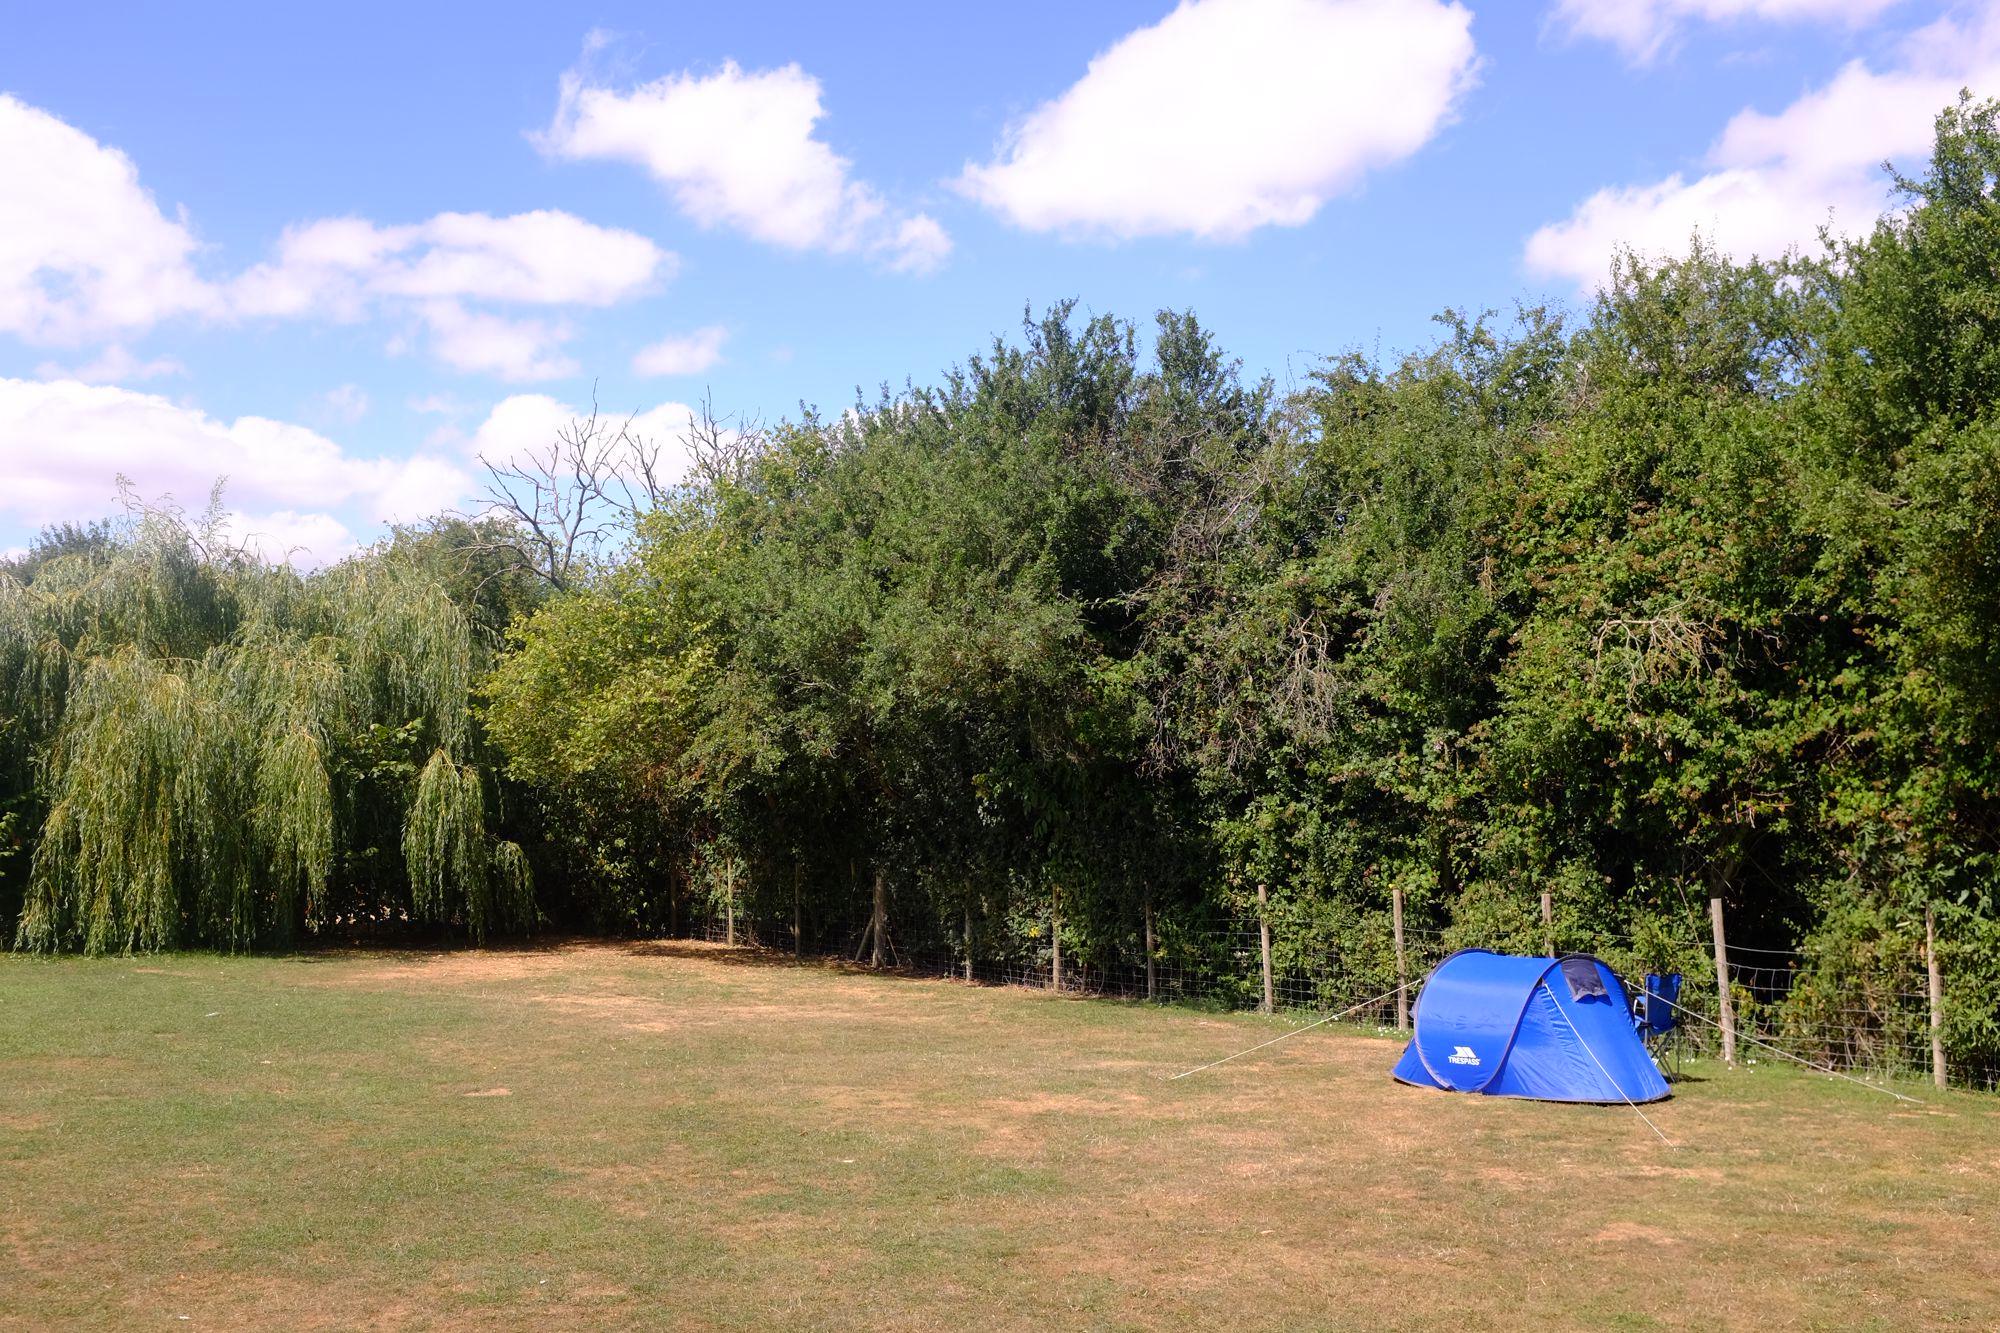 Charlbury Camping | Campsites near Charlbury, Oxfordshire